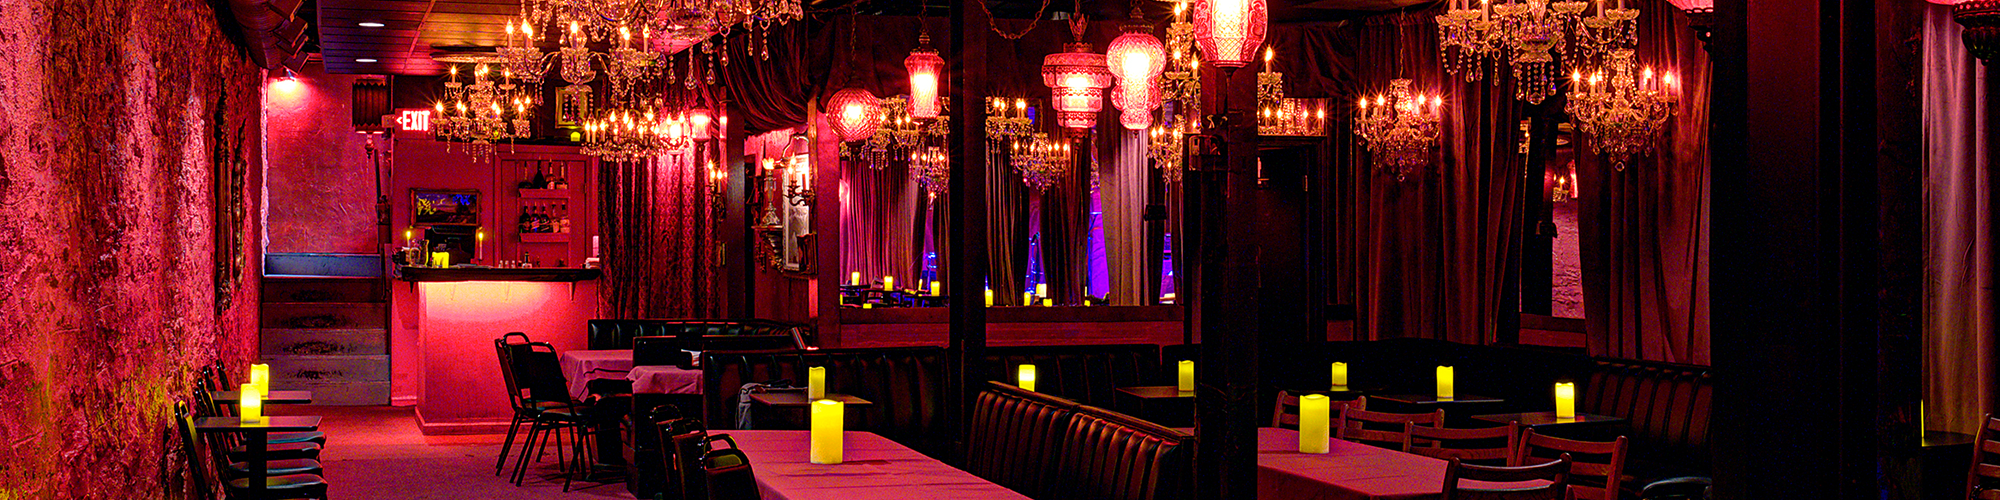 1809 Menu menu - green lady lounge | green lady lounge, 1809 grand